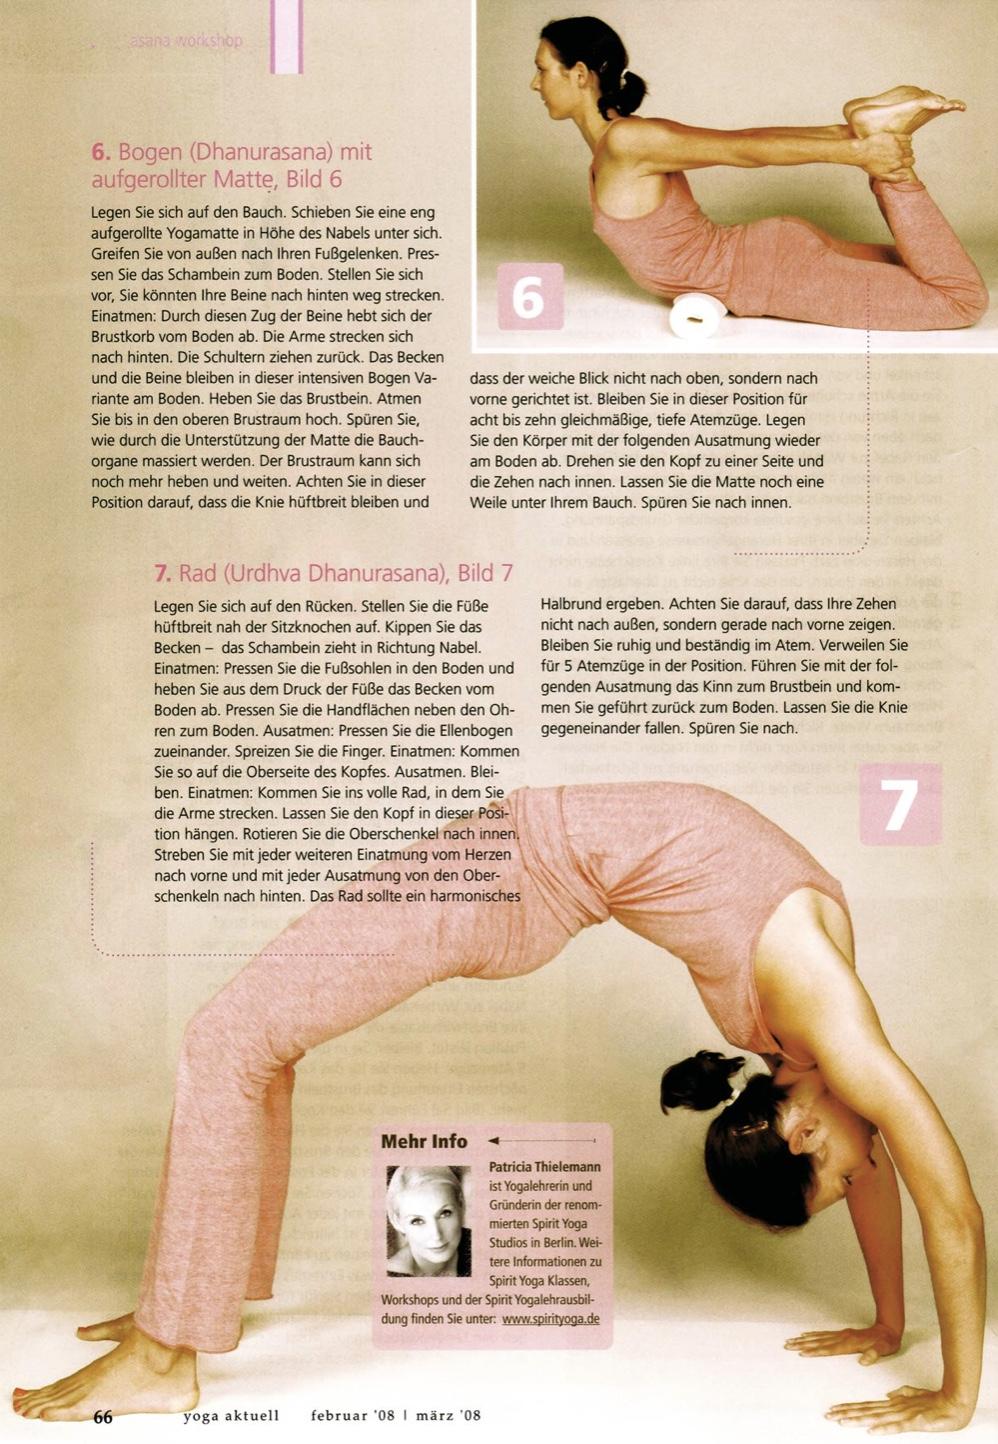 Yoga Aktuell Alexa Posth 4